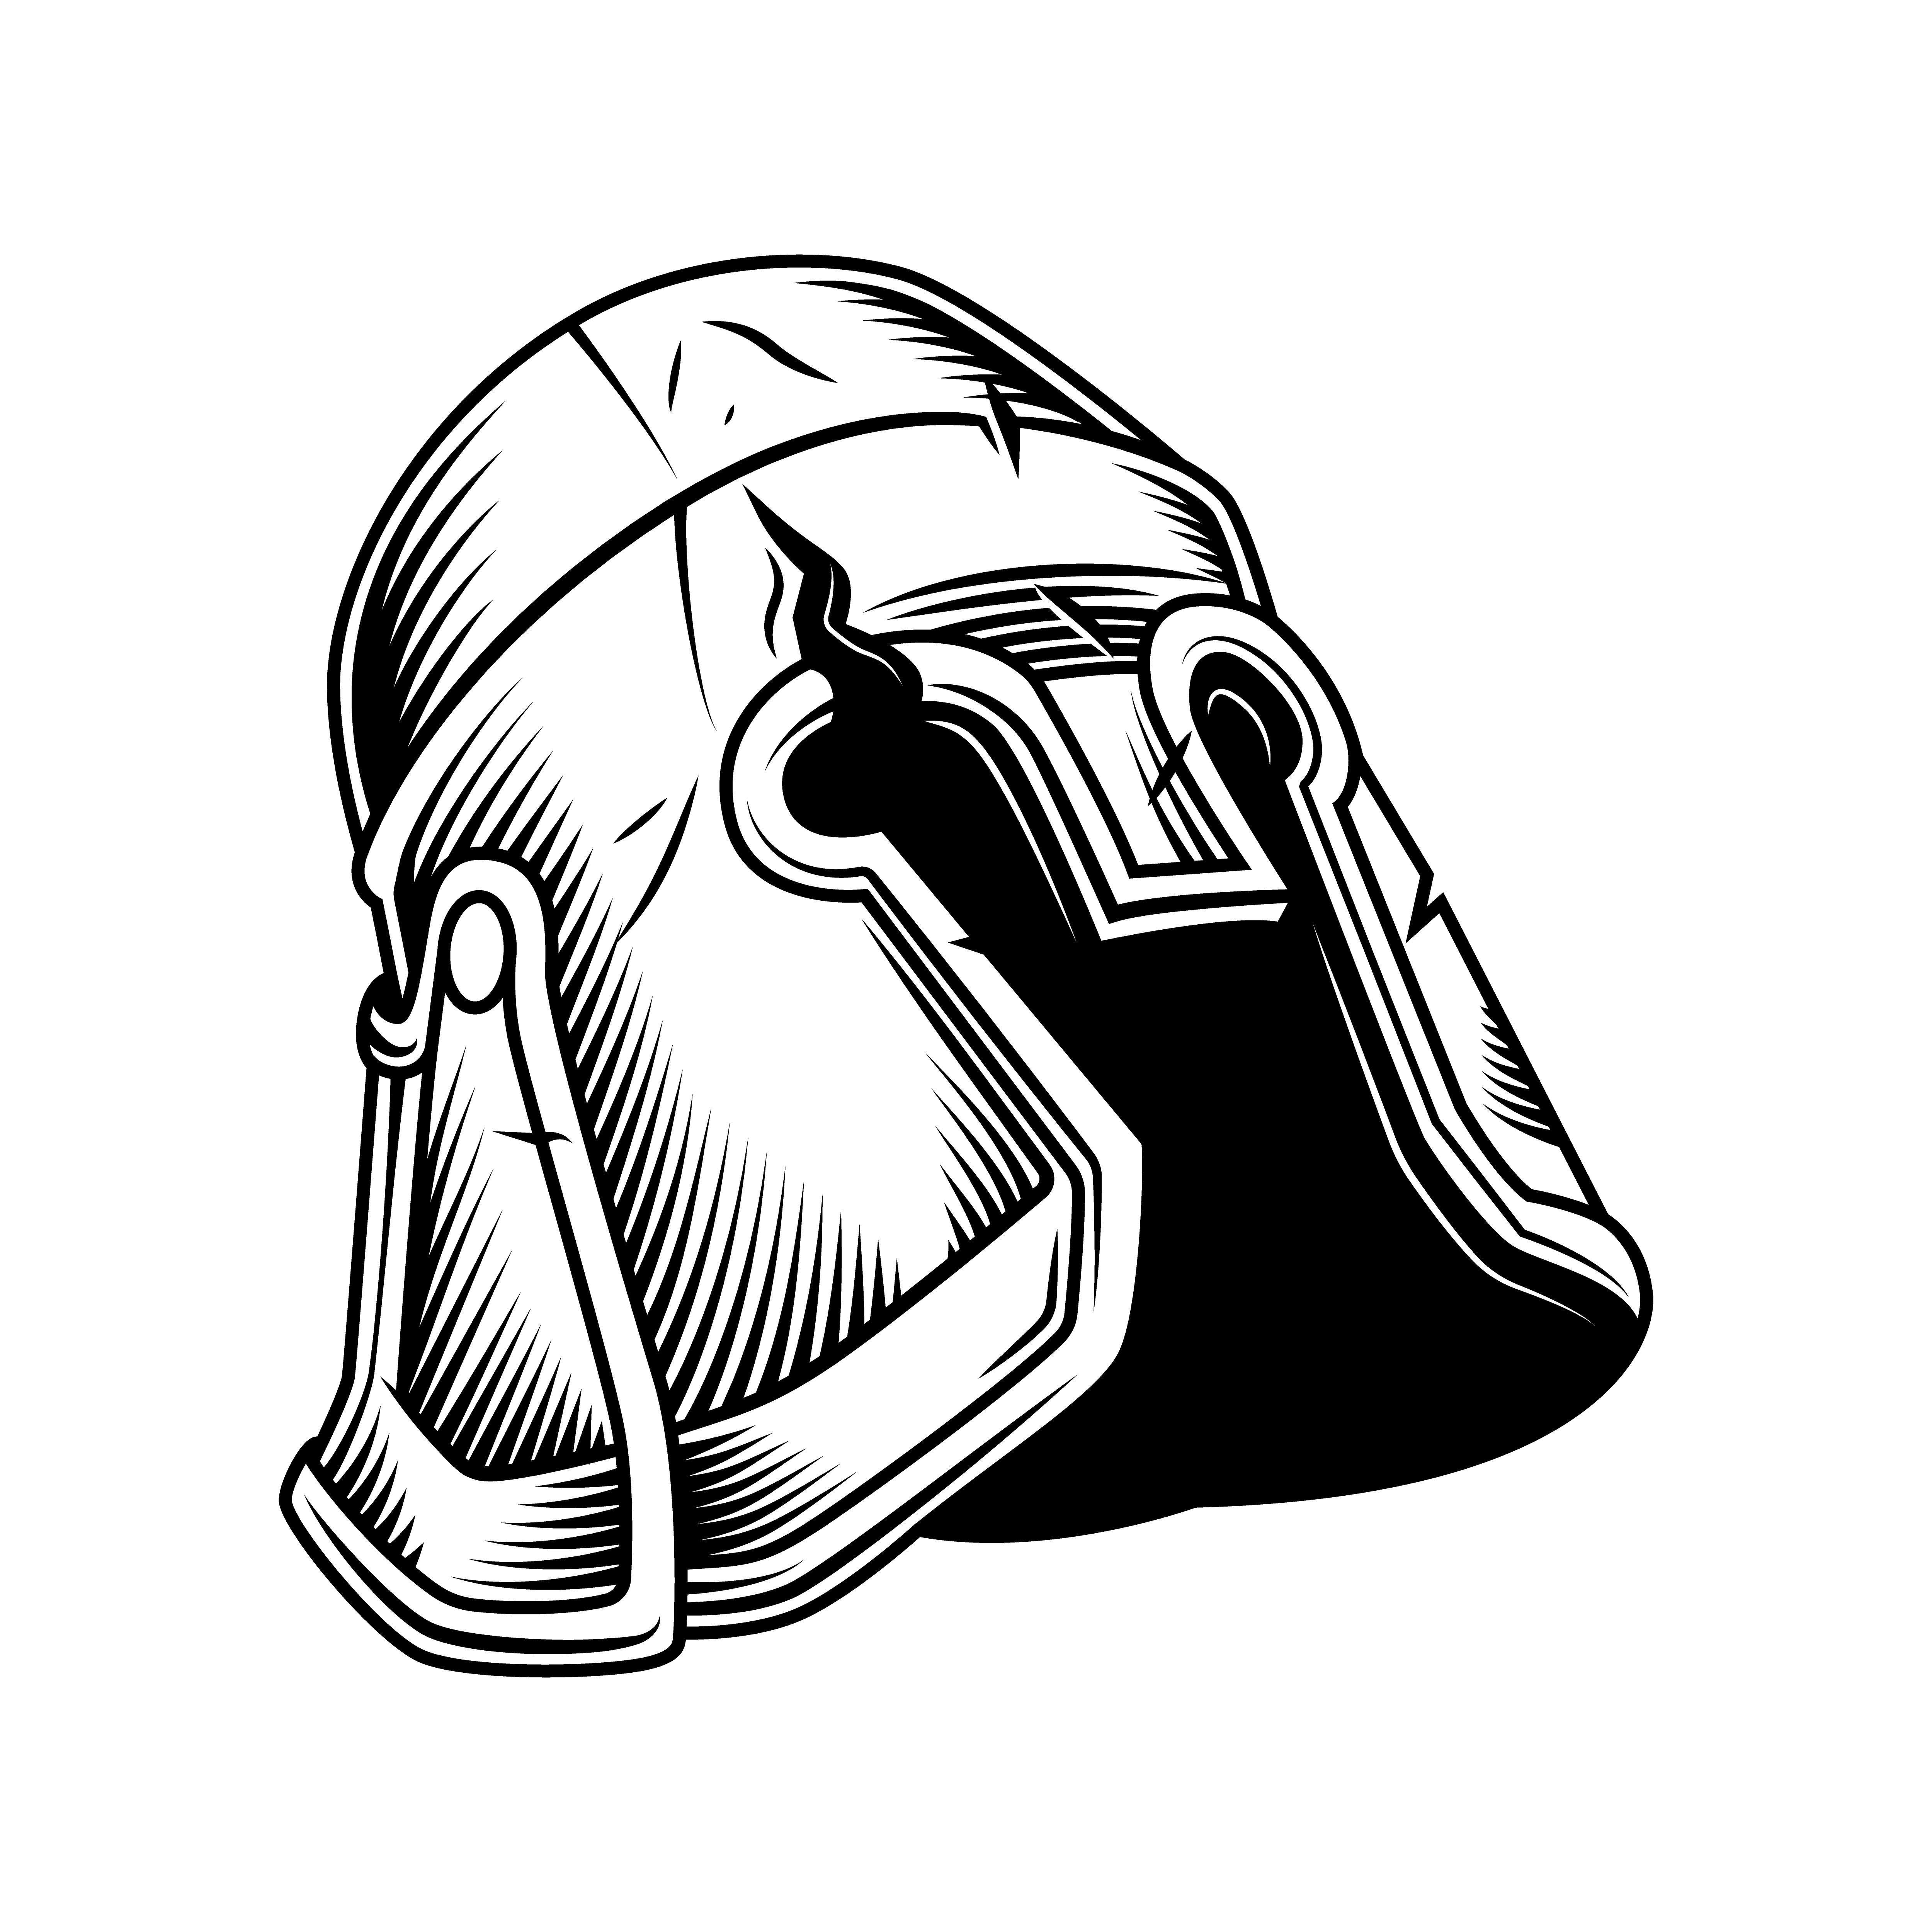 Helmet Illustration In 2020 Warriors Illustration Vintage Helmet Vector Free